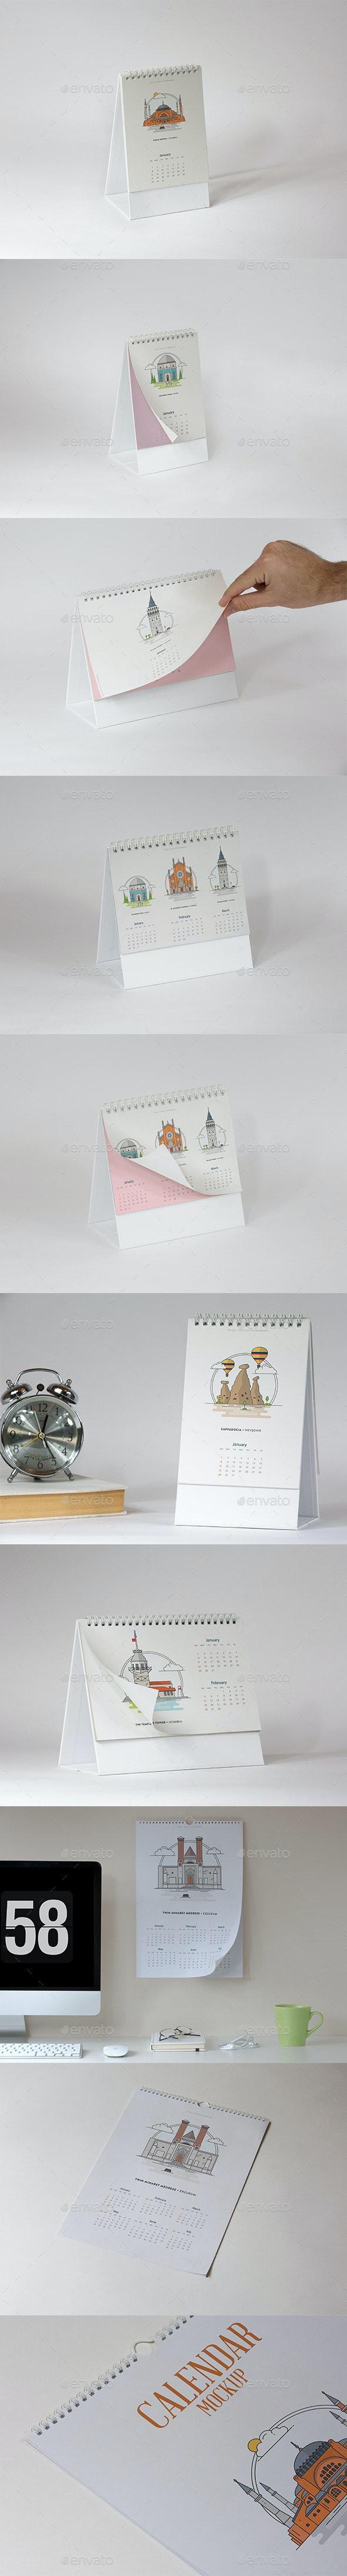 Calendar Mockup Pack - Print Product Mock-Ups